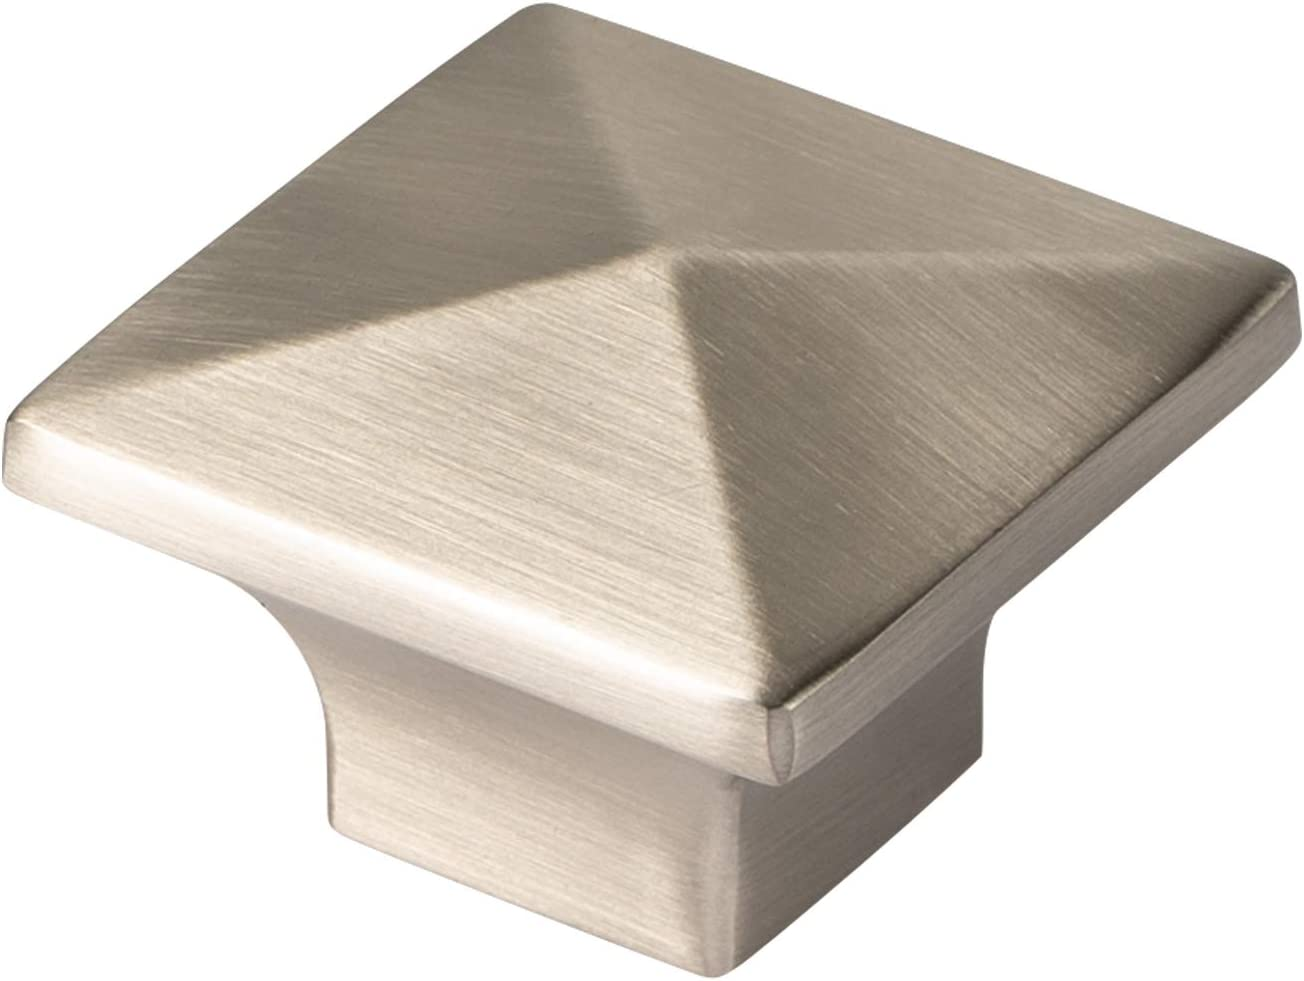 Lot 10//25pcs Square Pyramid Cabinet Handle Door Pull Drawer Knob Hardware